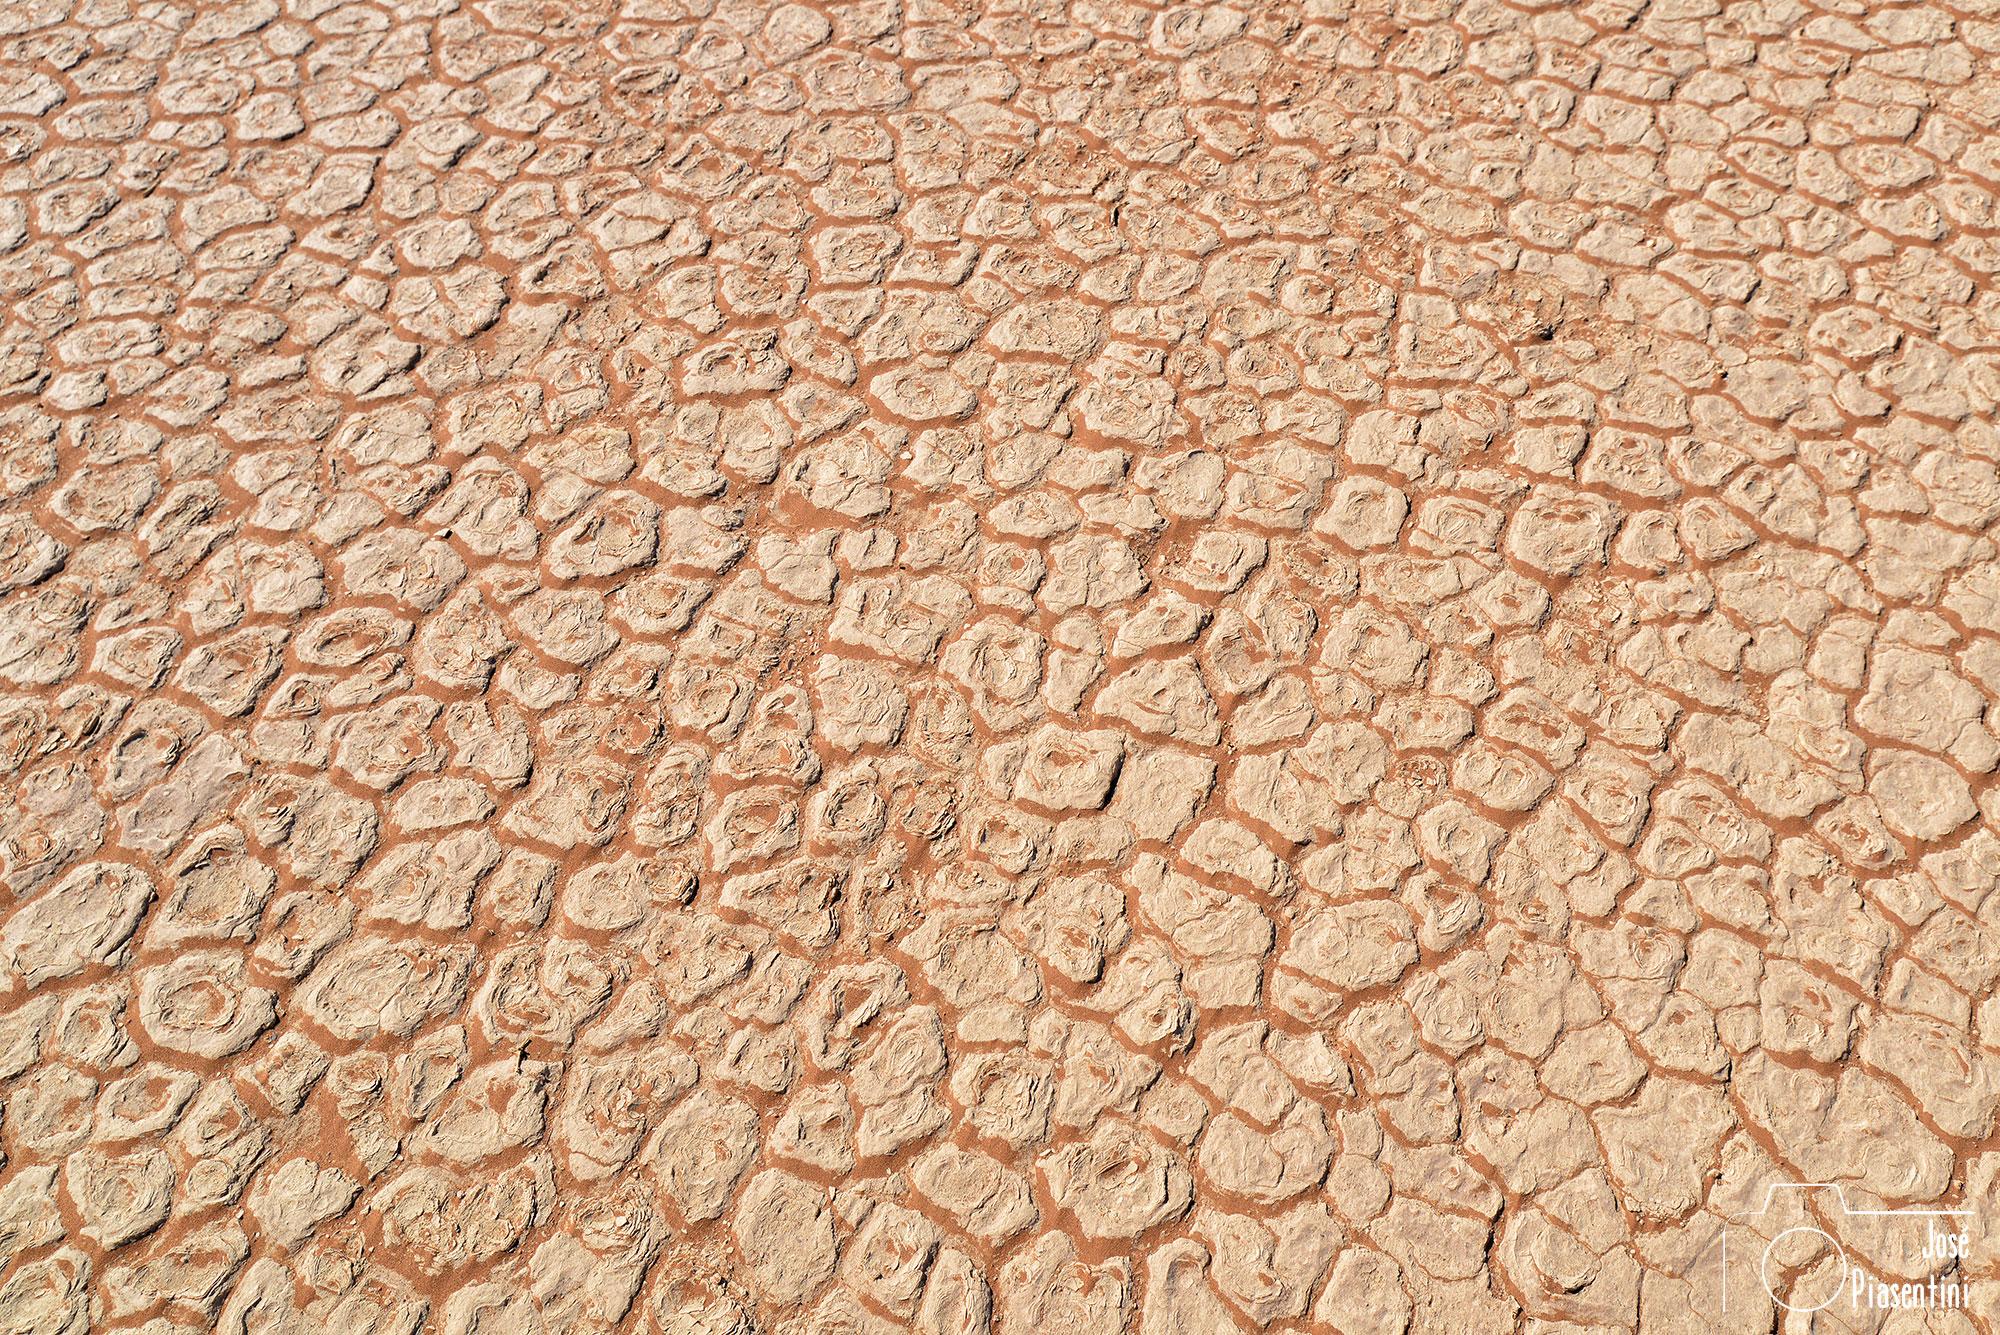 Textures of Namib Desert